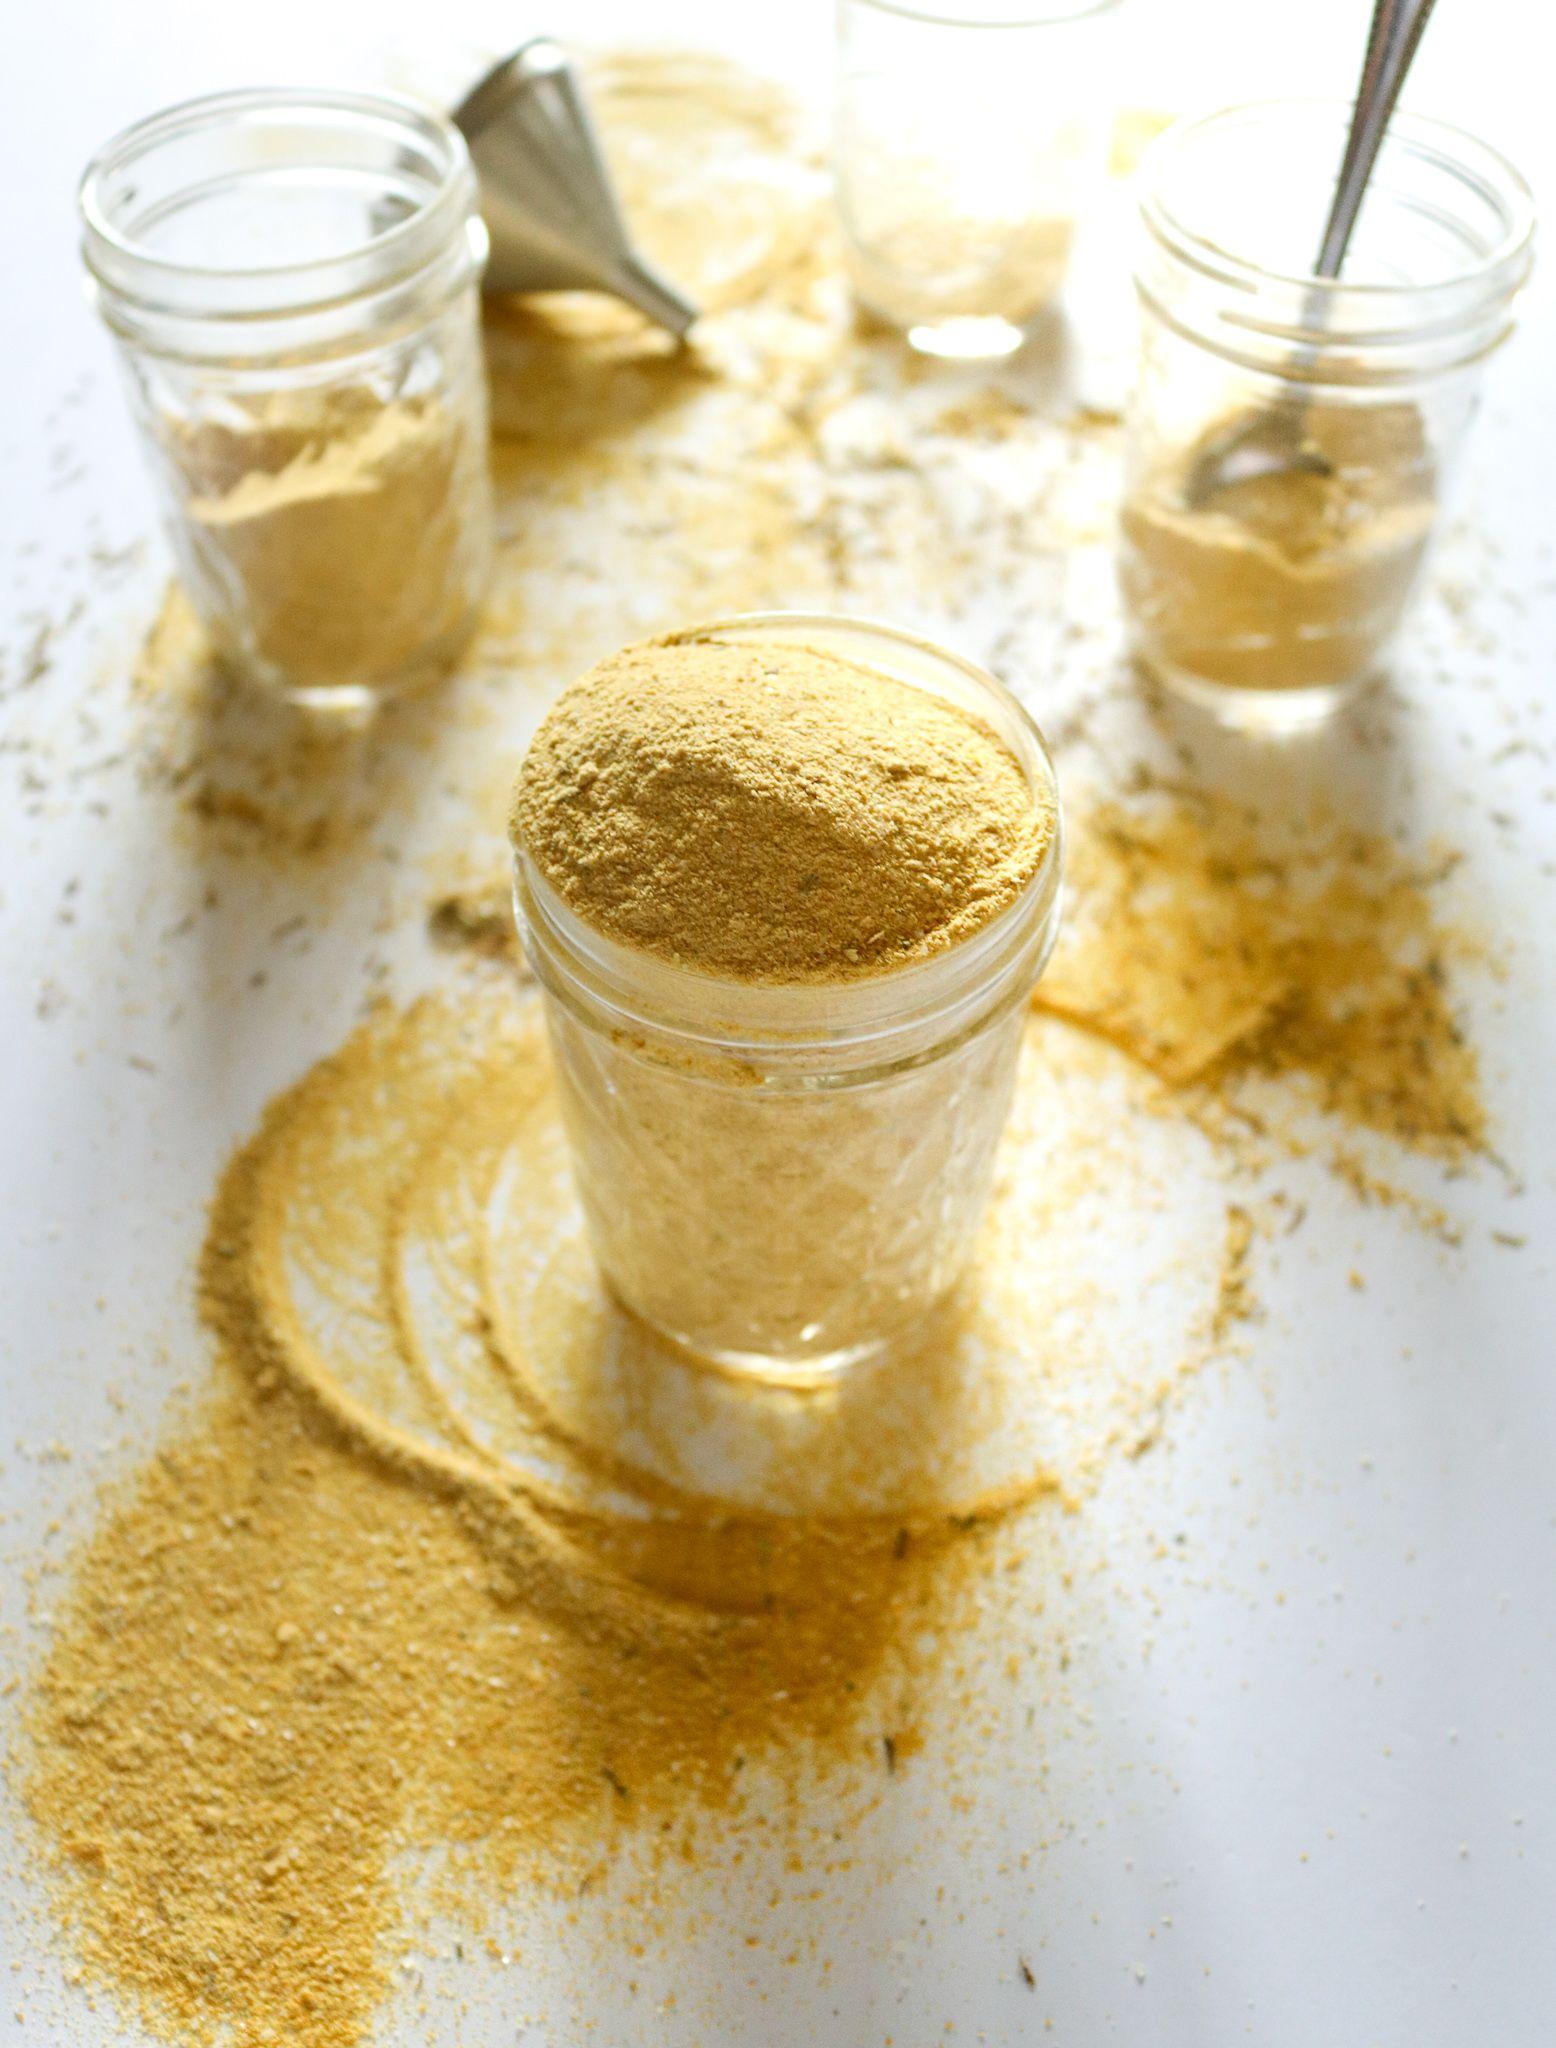 LifeChanging Chicken(less) Bouillon Powder Recipe